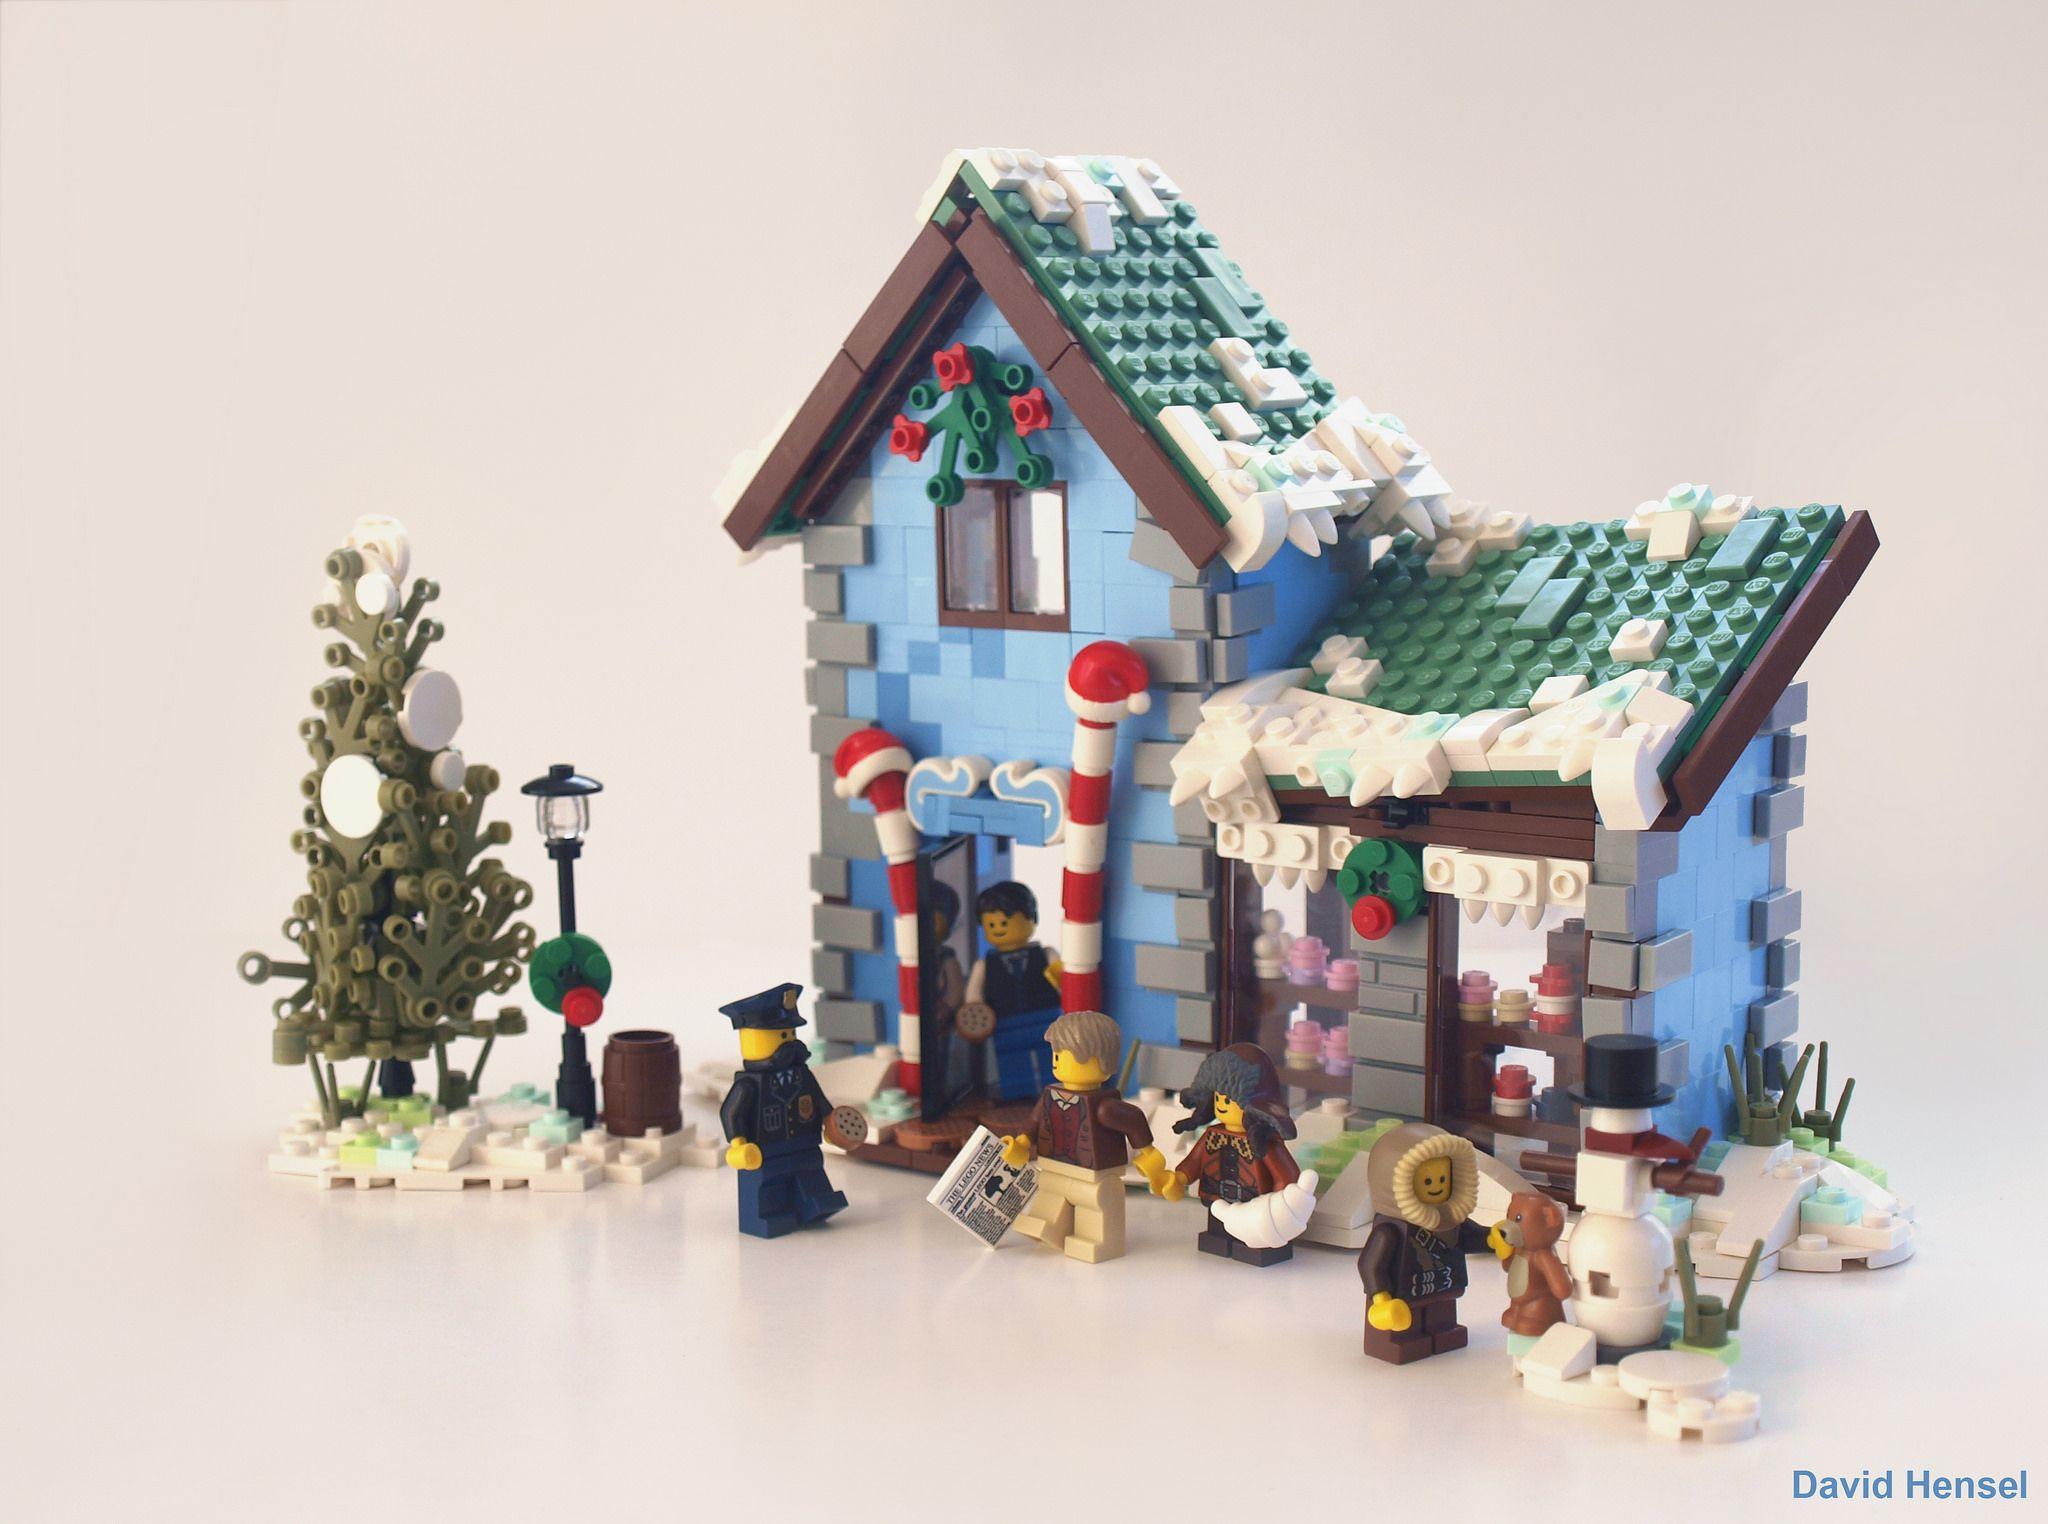 Winter Village Candyshop Lego Christmas Village Lego Winter Village Lego Winter